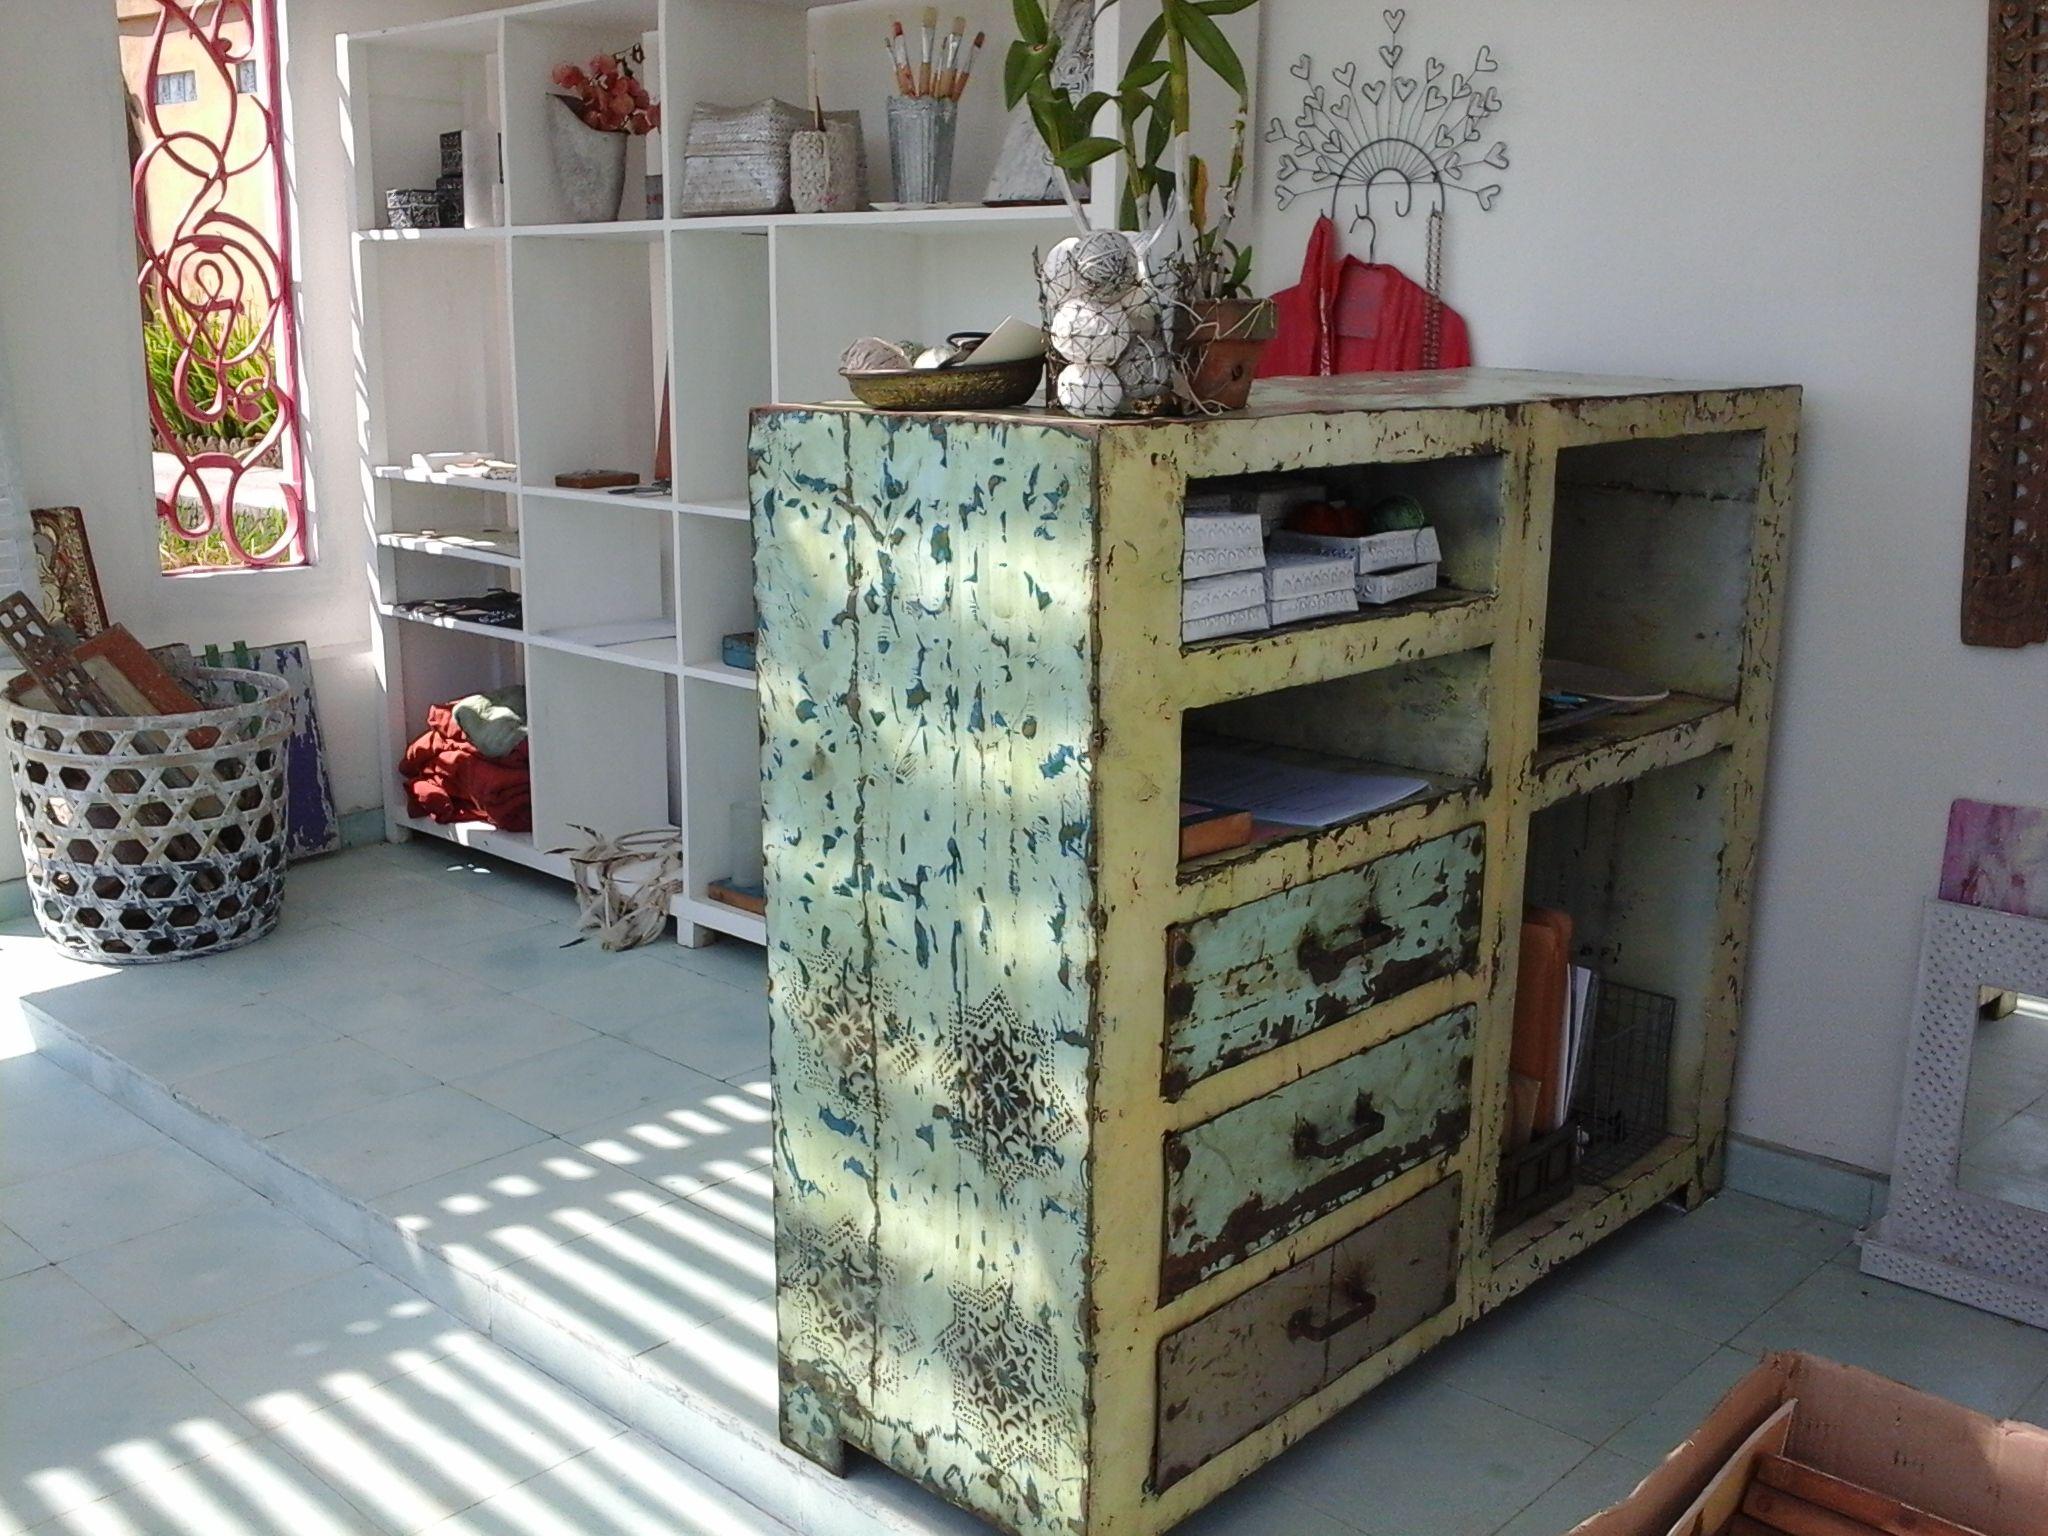 Meuble Bas Blanc Fabriqu En Bidon Recycl Fabrication Balinaise  # Meuble En Bidon Recycle